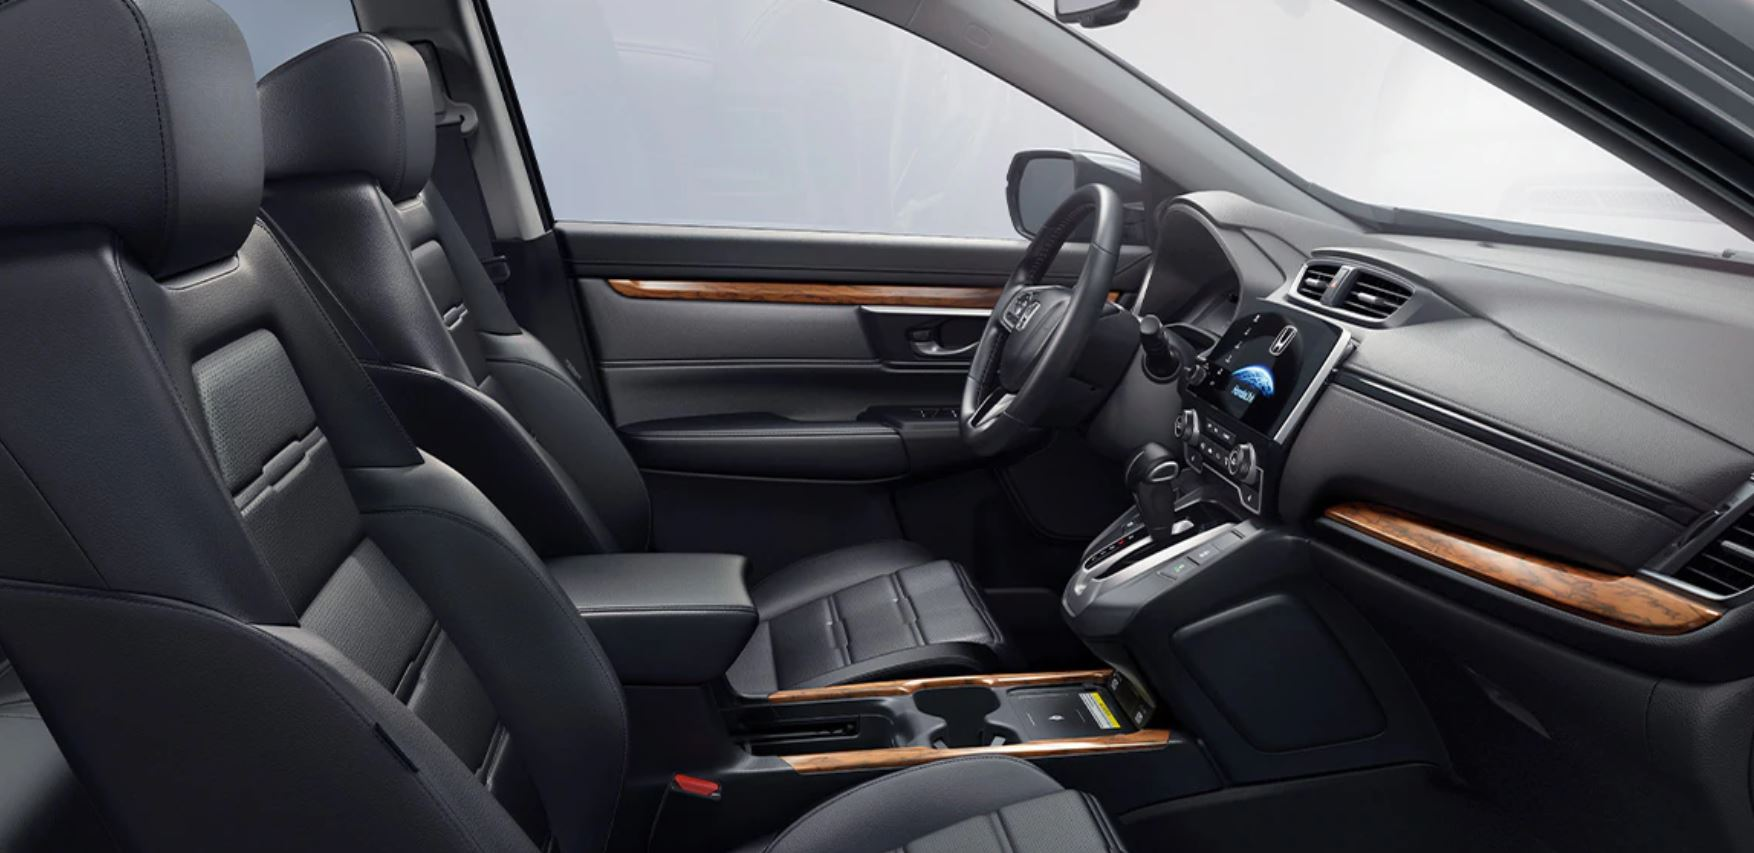 2020 CR-V Cockpit